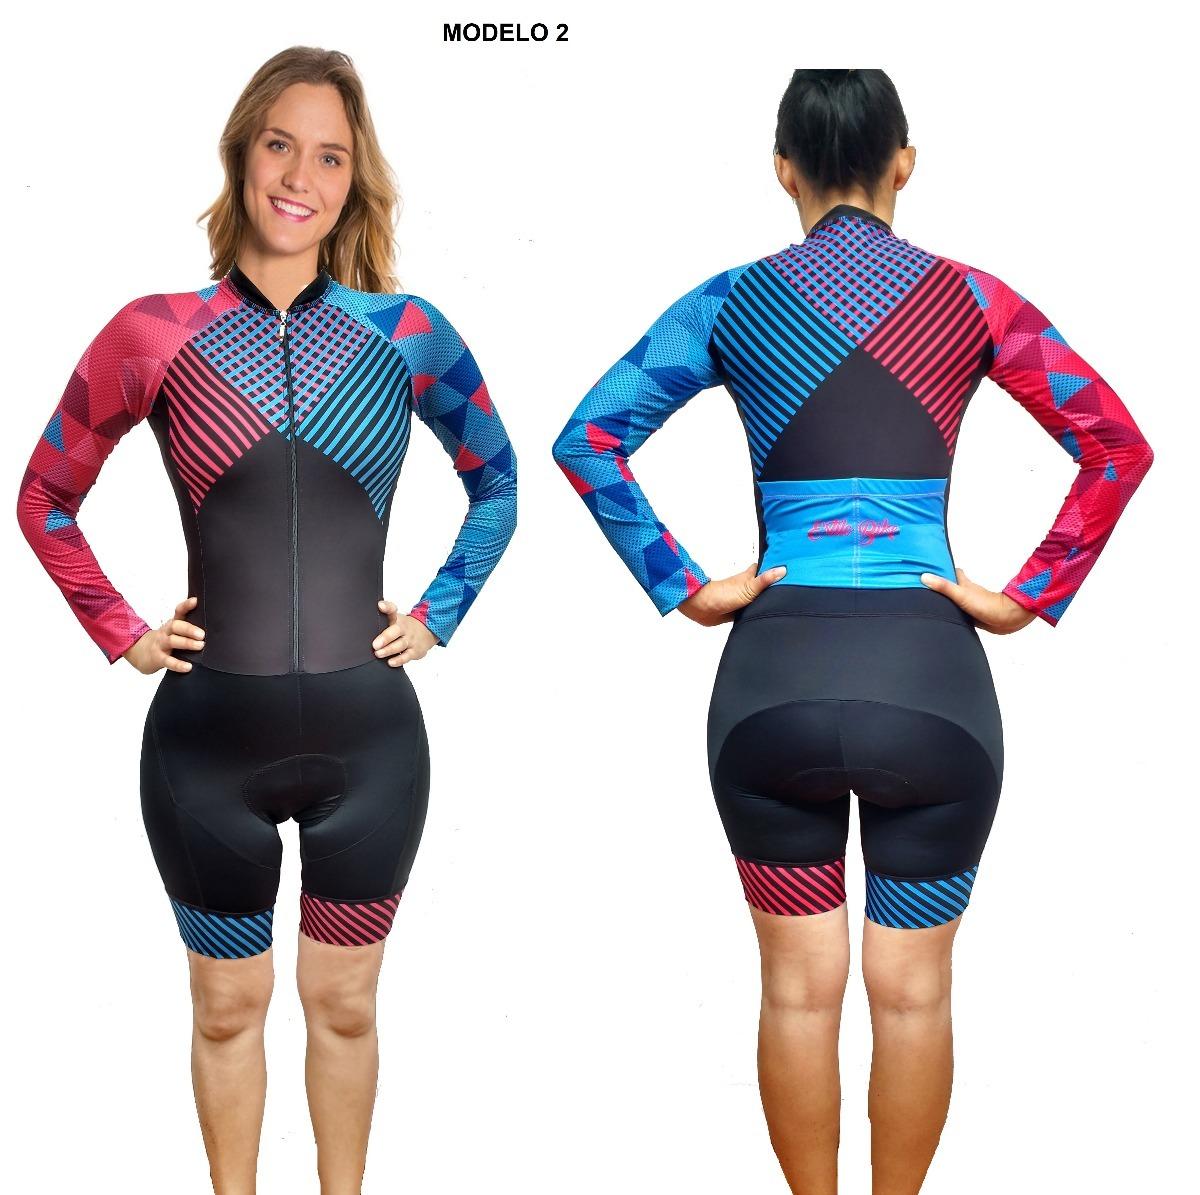 Uniforme Enterizo Ciclismo Mujer -   184.900 en Mercado Libre b4feca69edc88